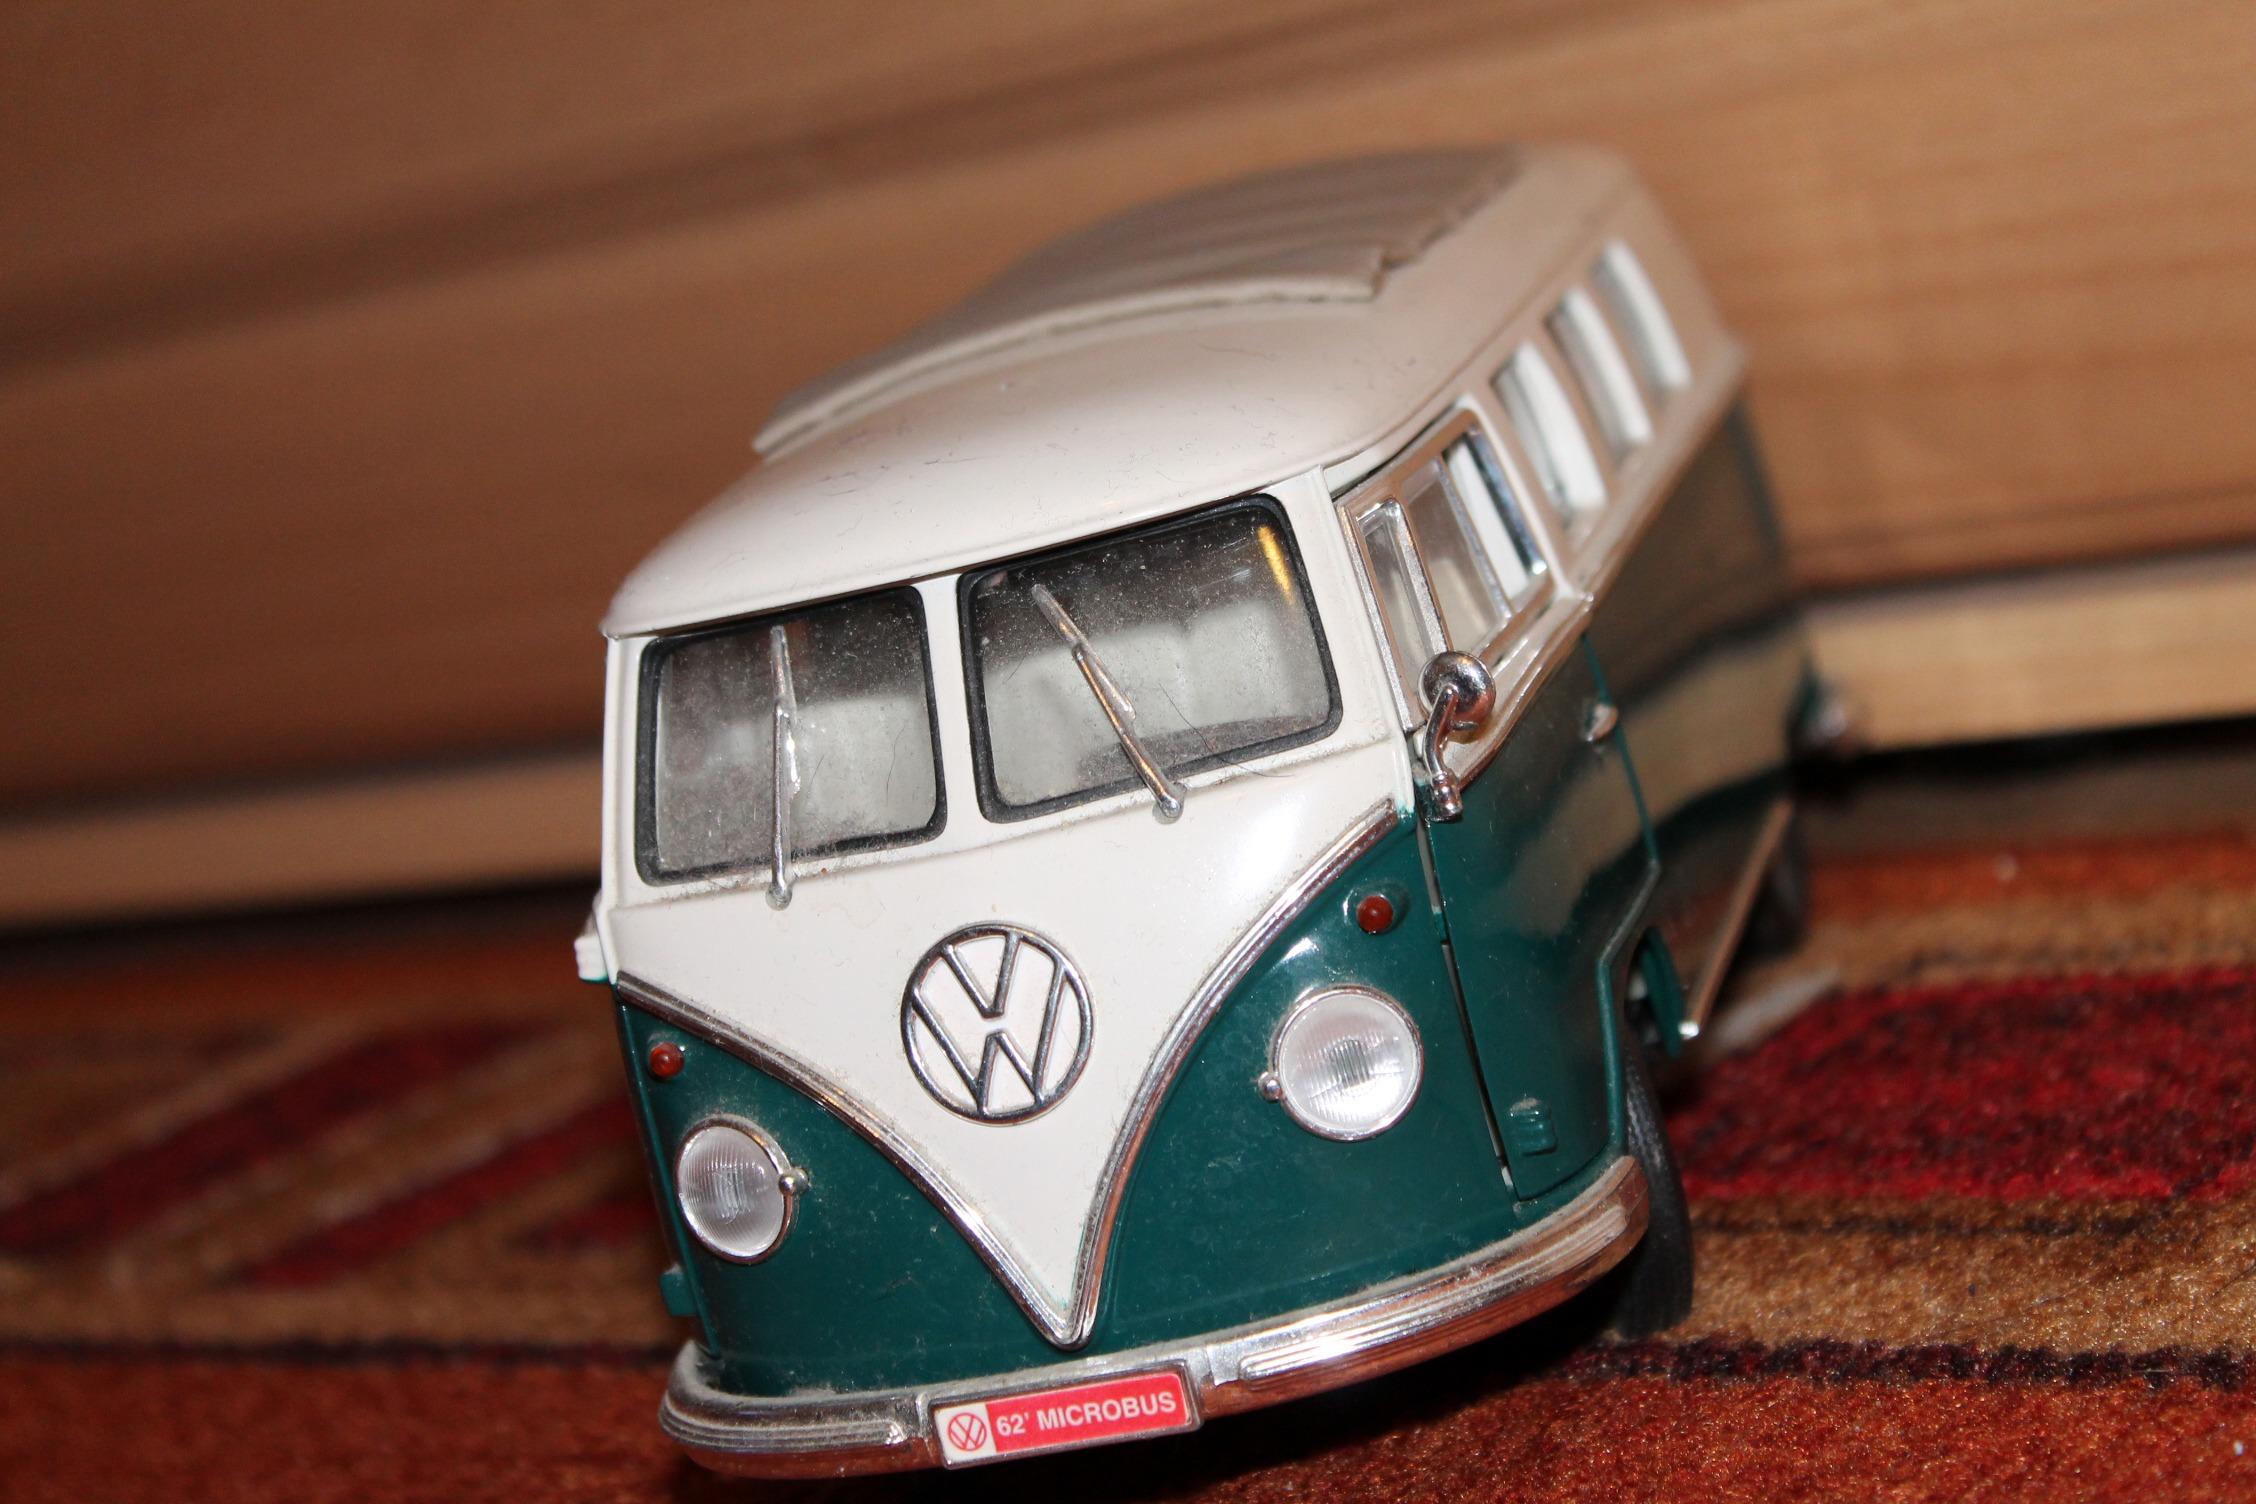 Fotos Gratis Coche Rueda Vw Volkswagen Vehiculo Autobus Vw